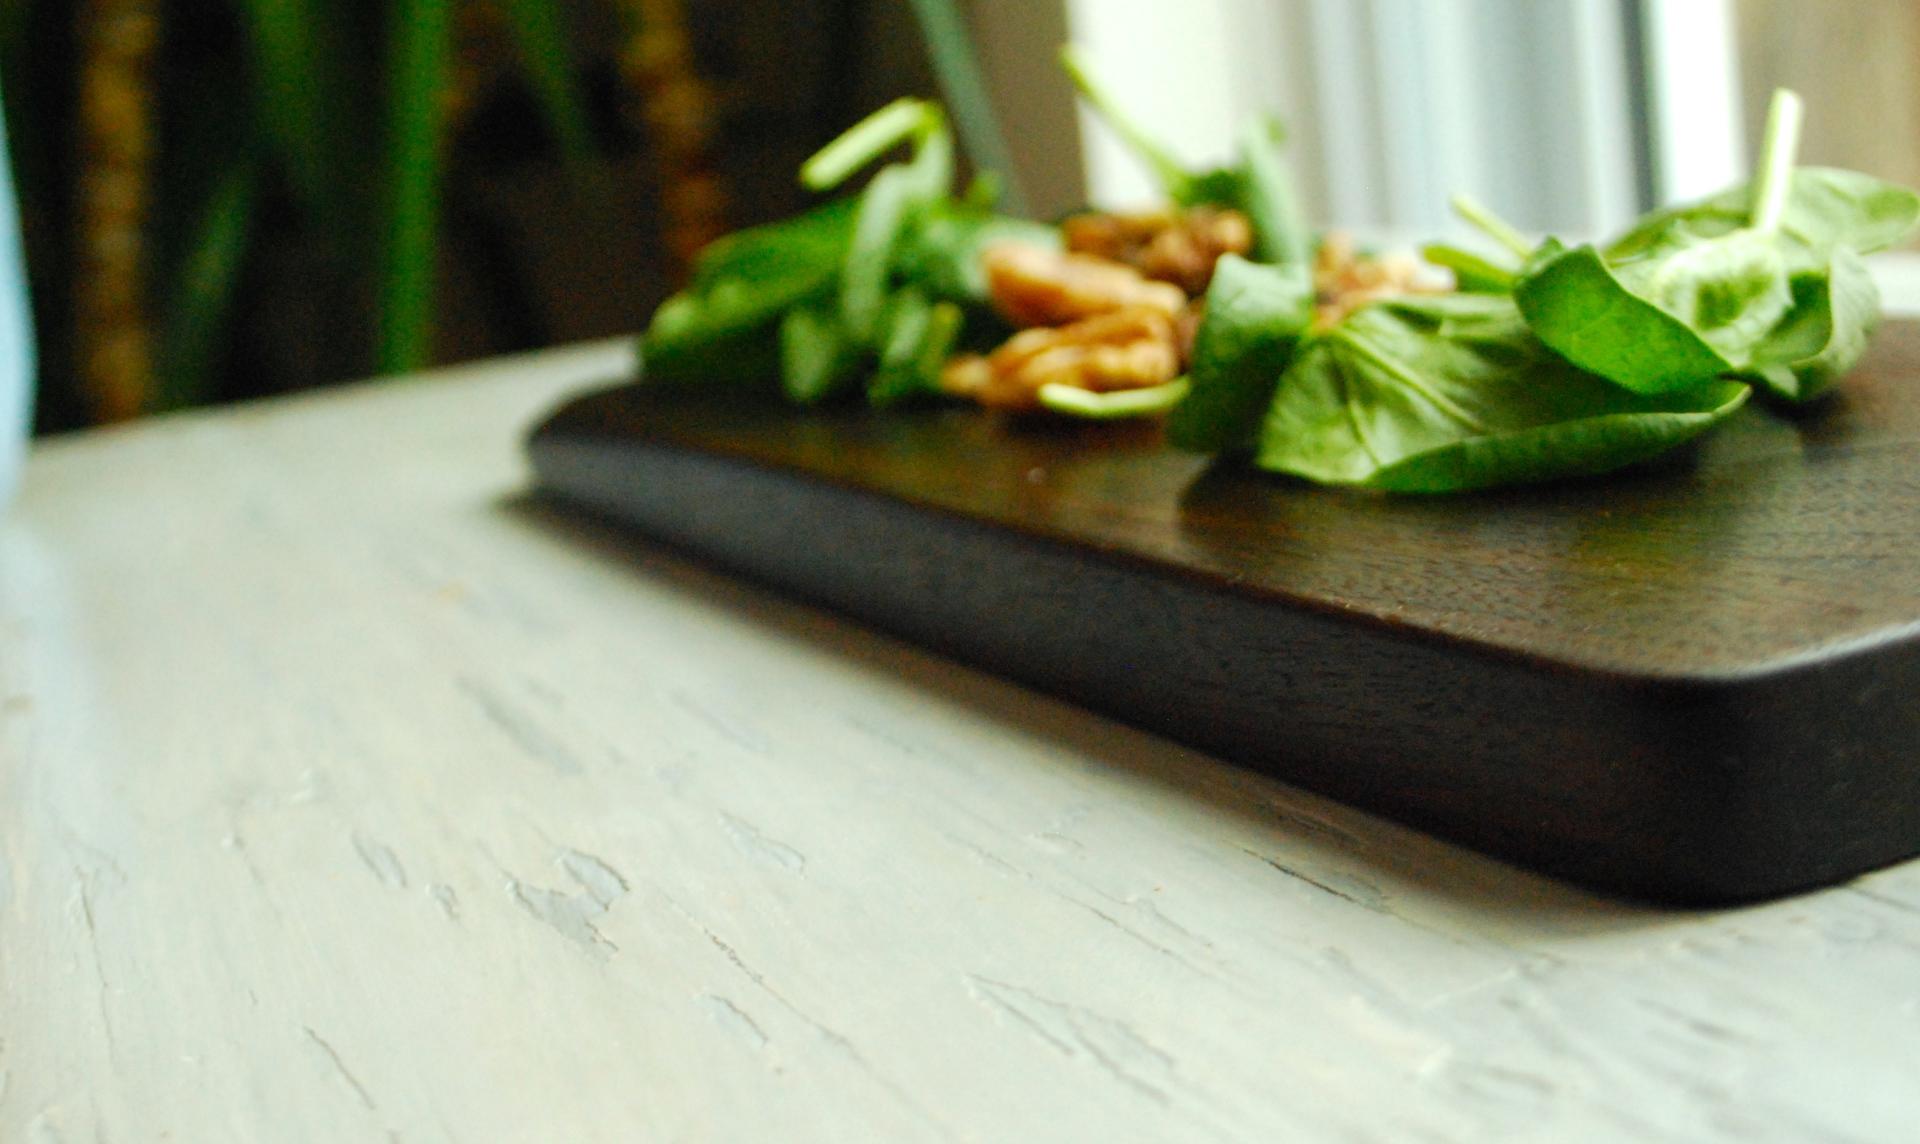 Walnut Serving/Cutting Board